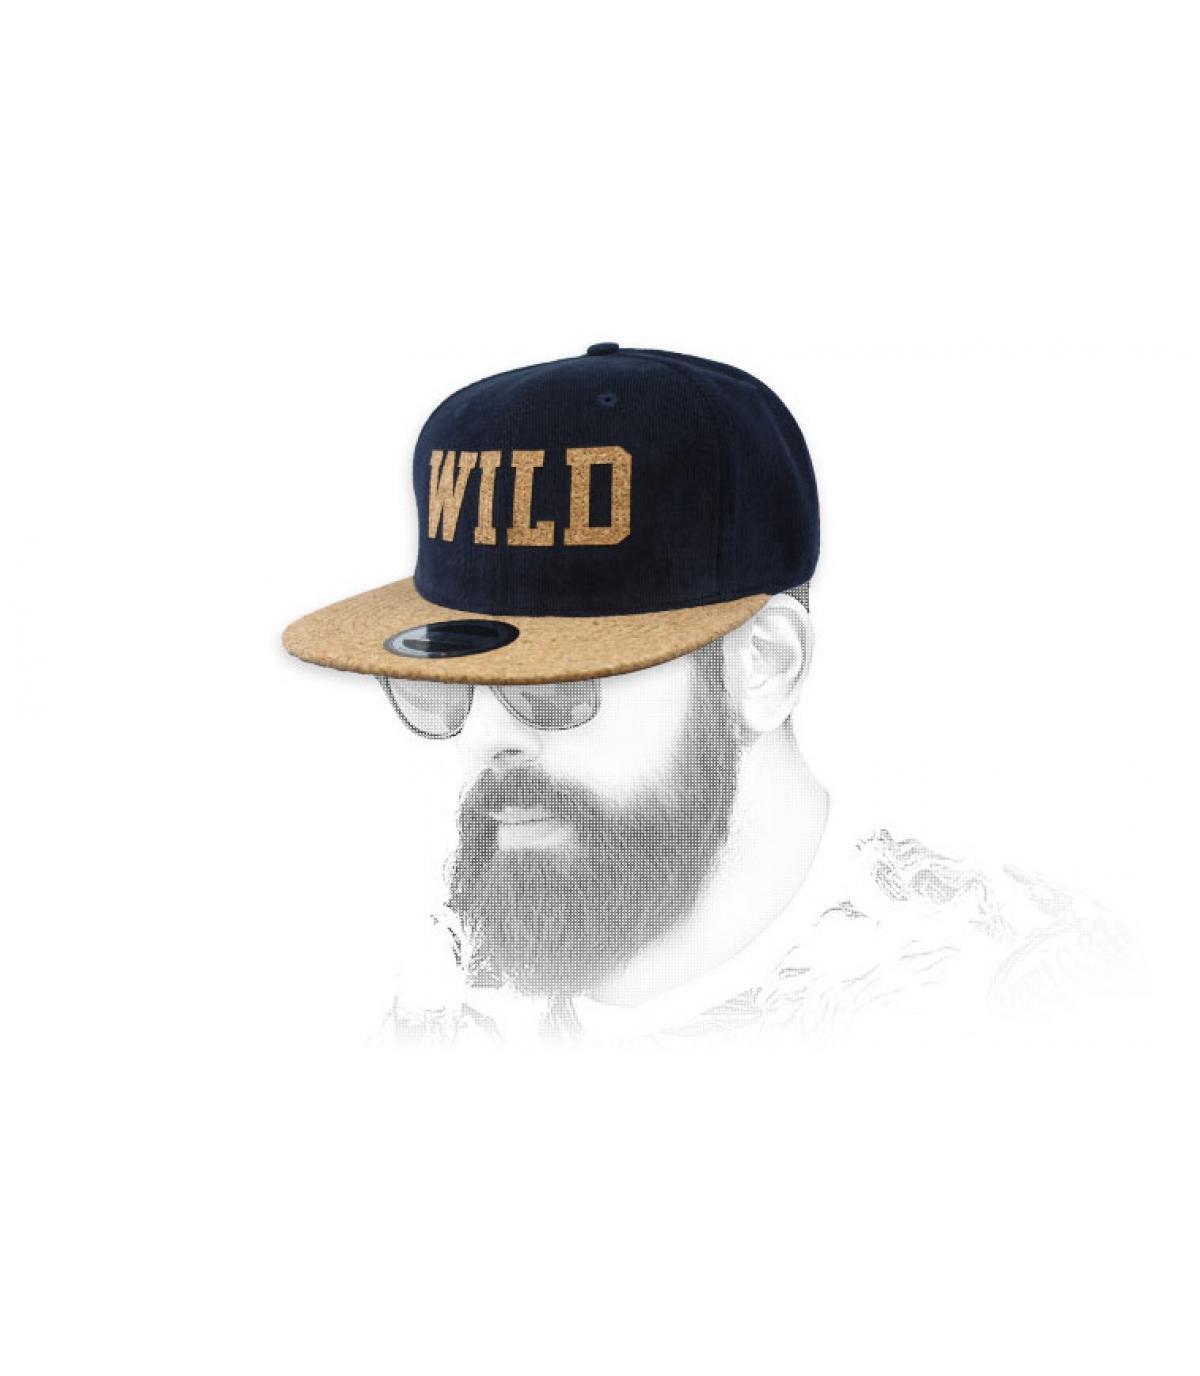 blue Wild snapback cork